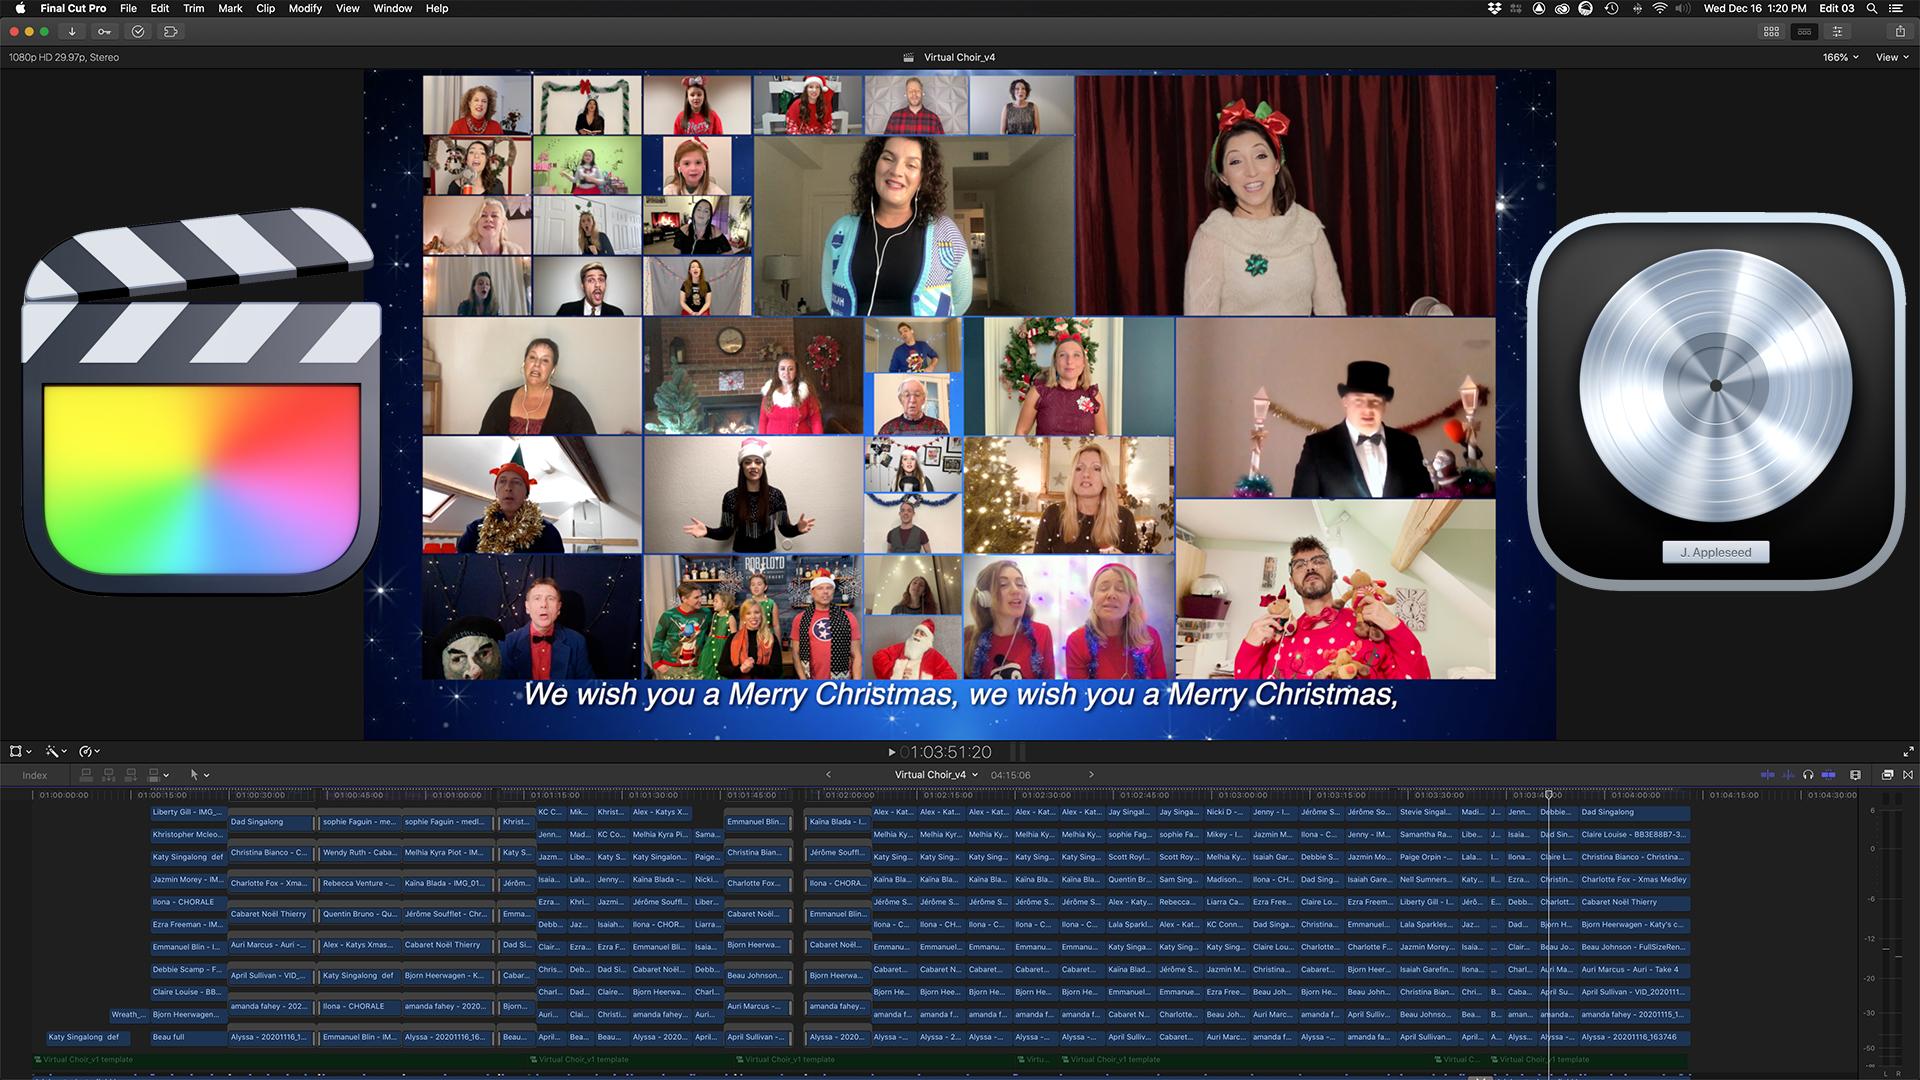 Holiday Cabaret de Noël - Virtual Show Production in Final Cut Pro